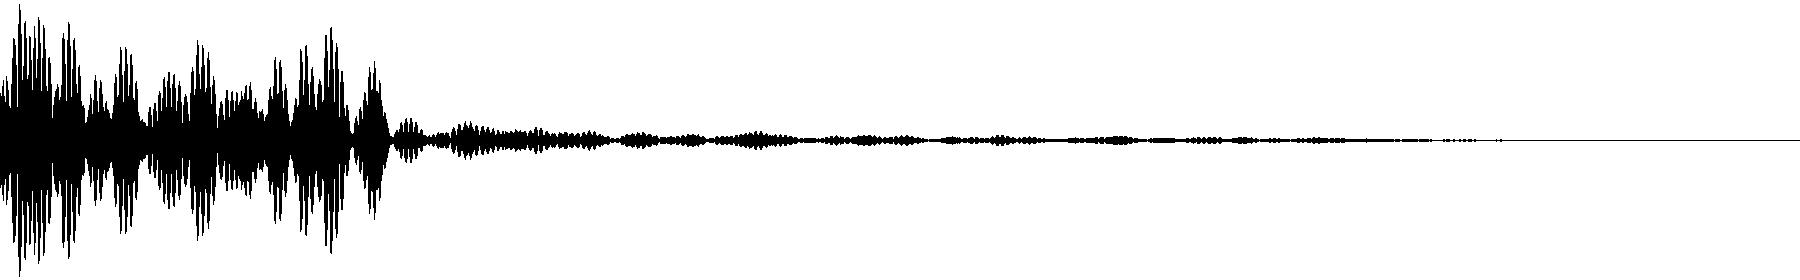 vedh synth cut 133 dm9